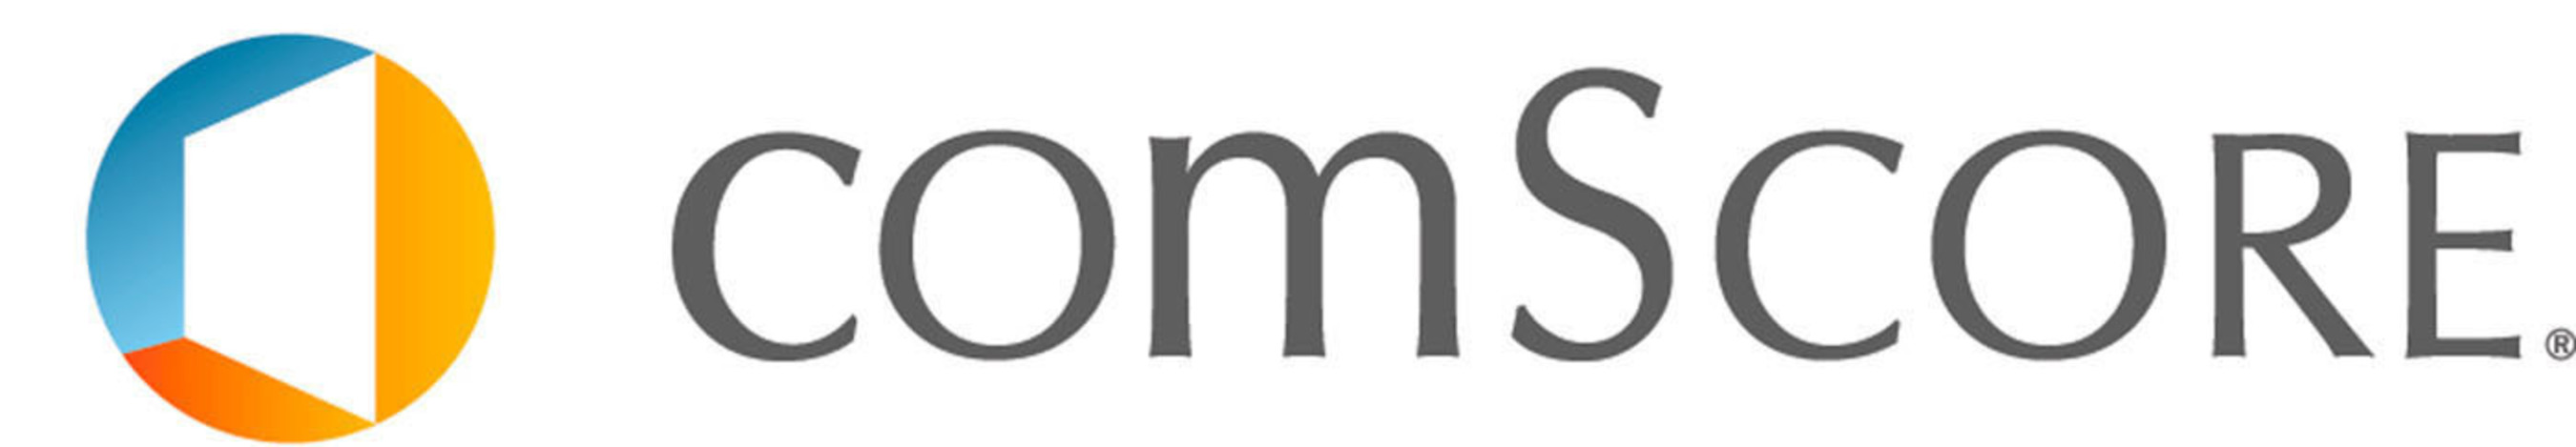 comScore logo. (PRNewsFoto/Comscore Networks)